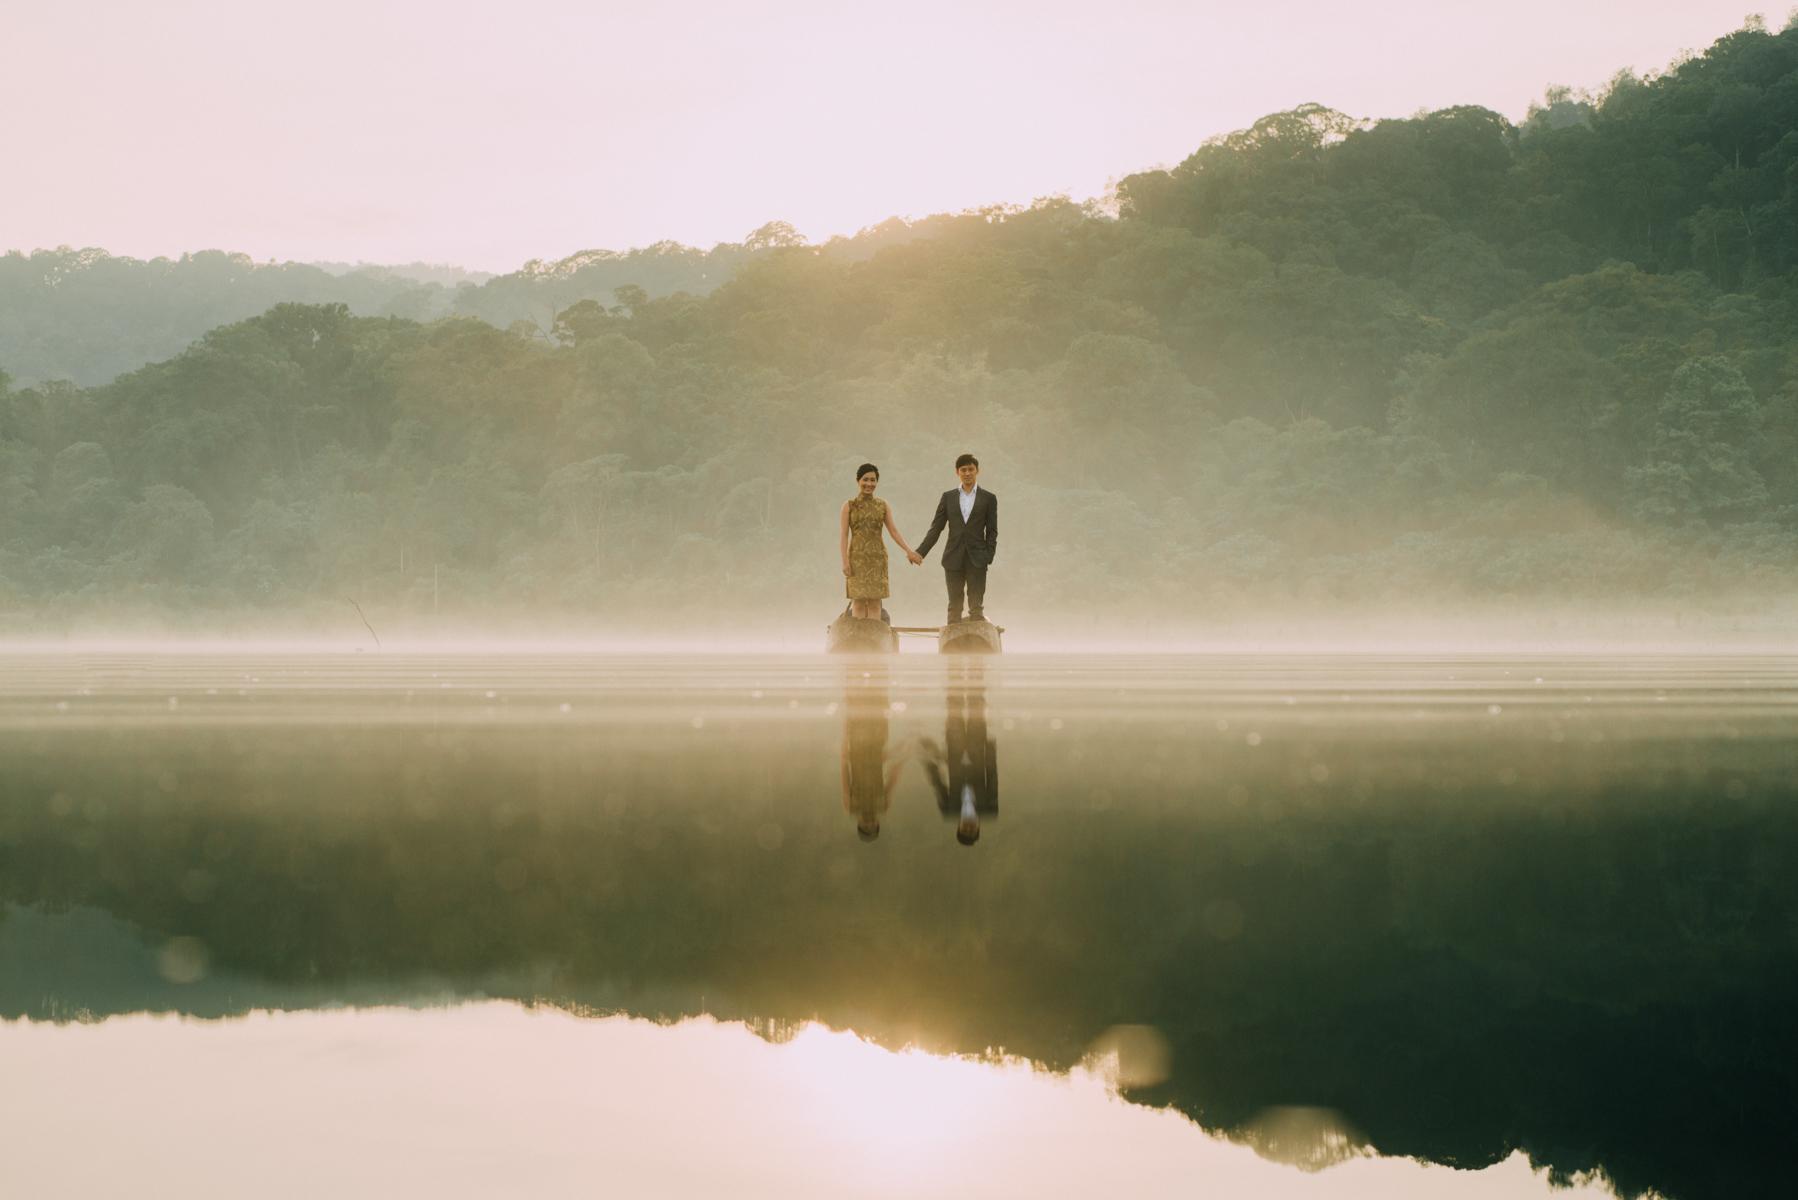 diktatphotography-baliweddingphotography-preweddinginbali-danautamblingan-uluwatu-03